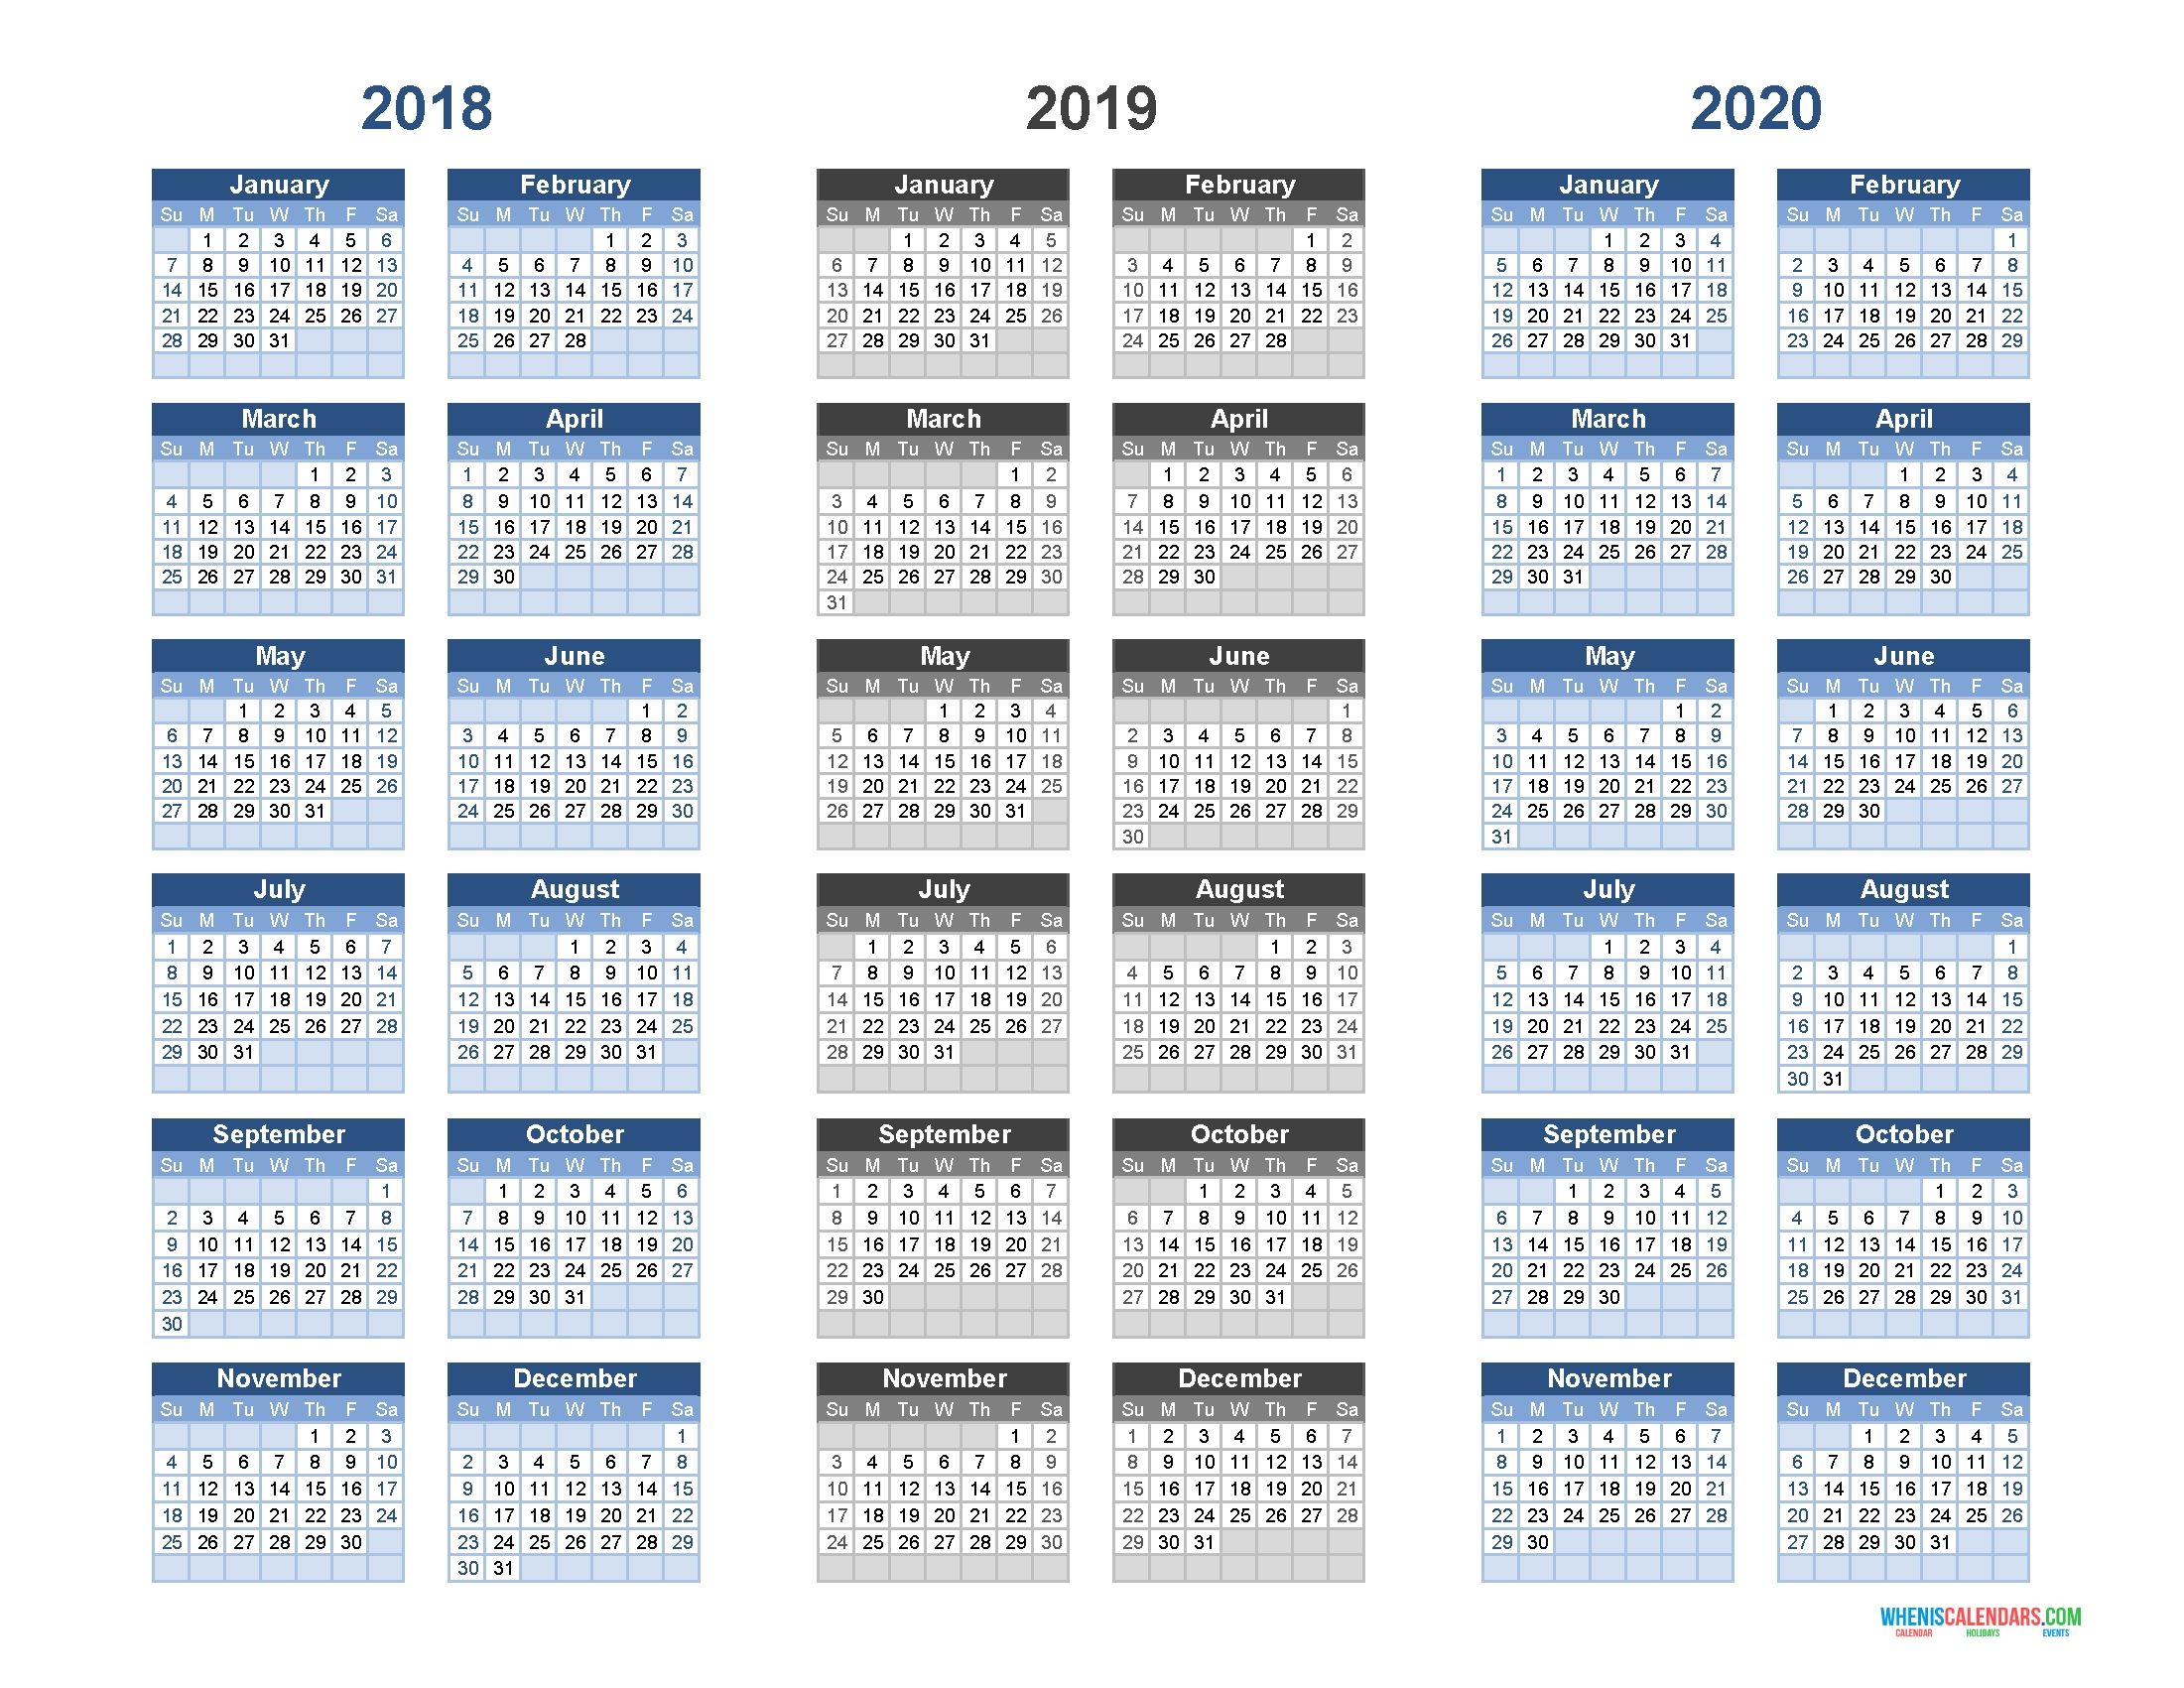 Printable Calendar 2018 2019 And 2020 - 3 Year Calendar | Free 3 Year Calendar 2019